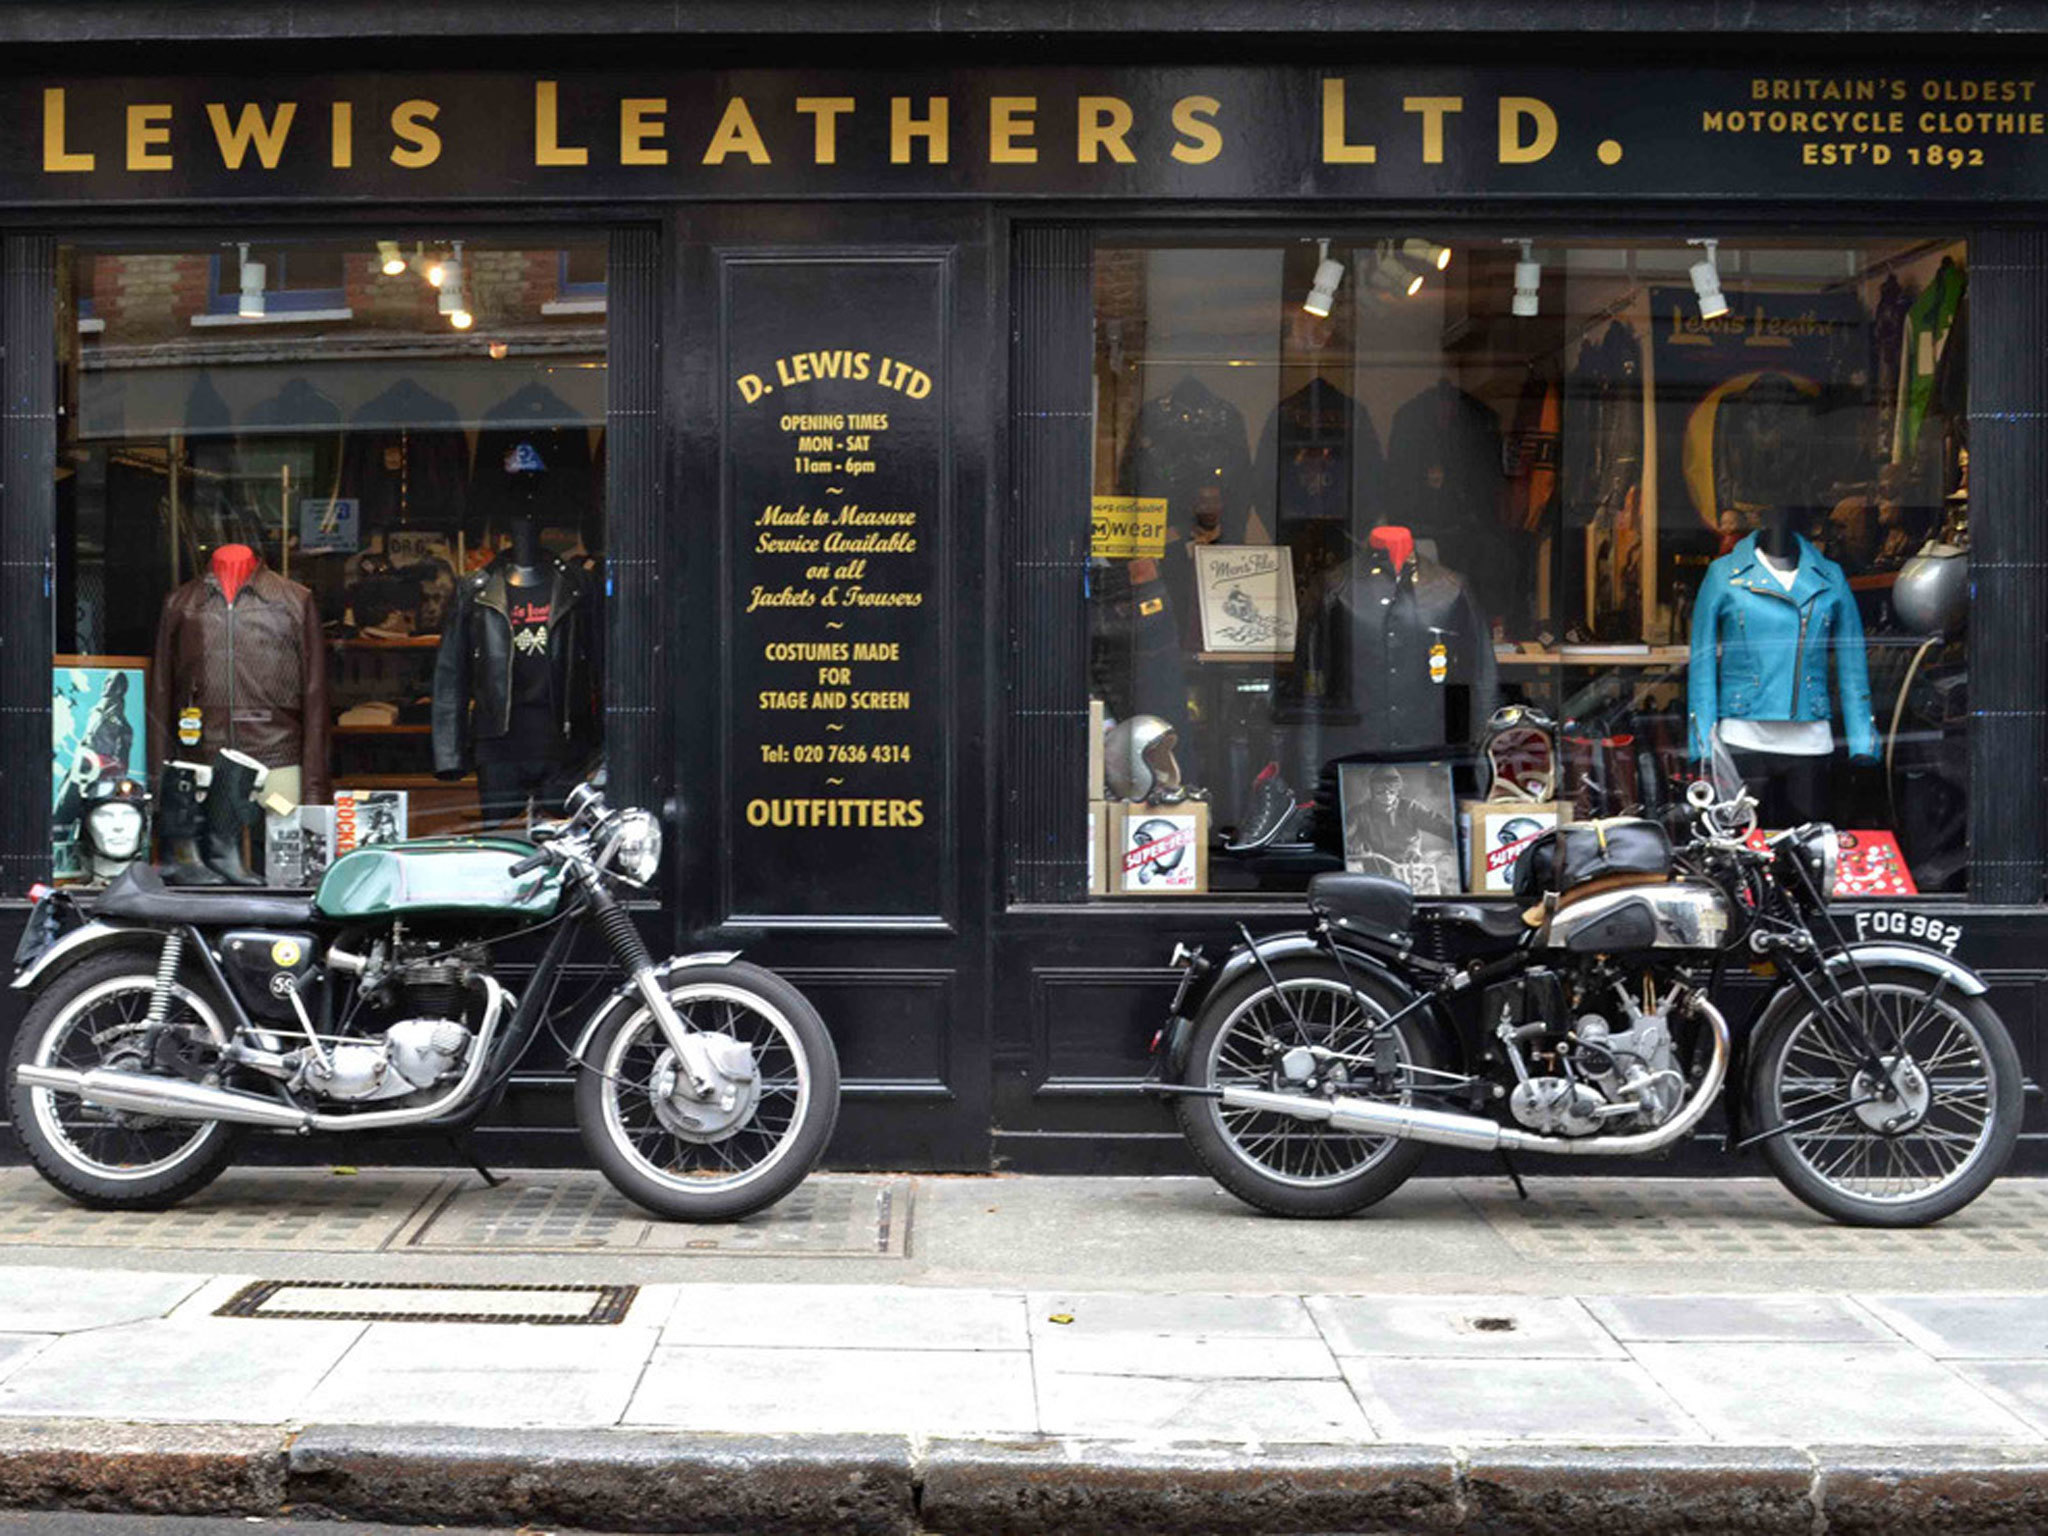 Lewis Leathers